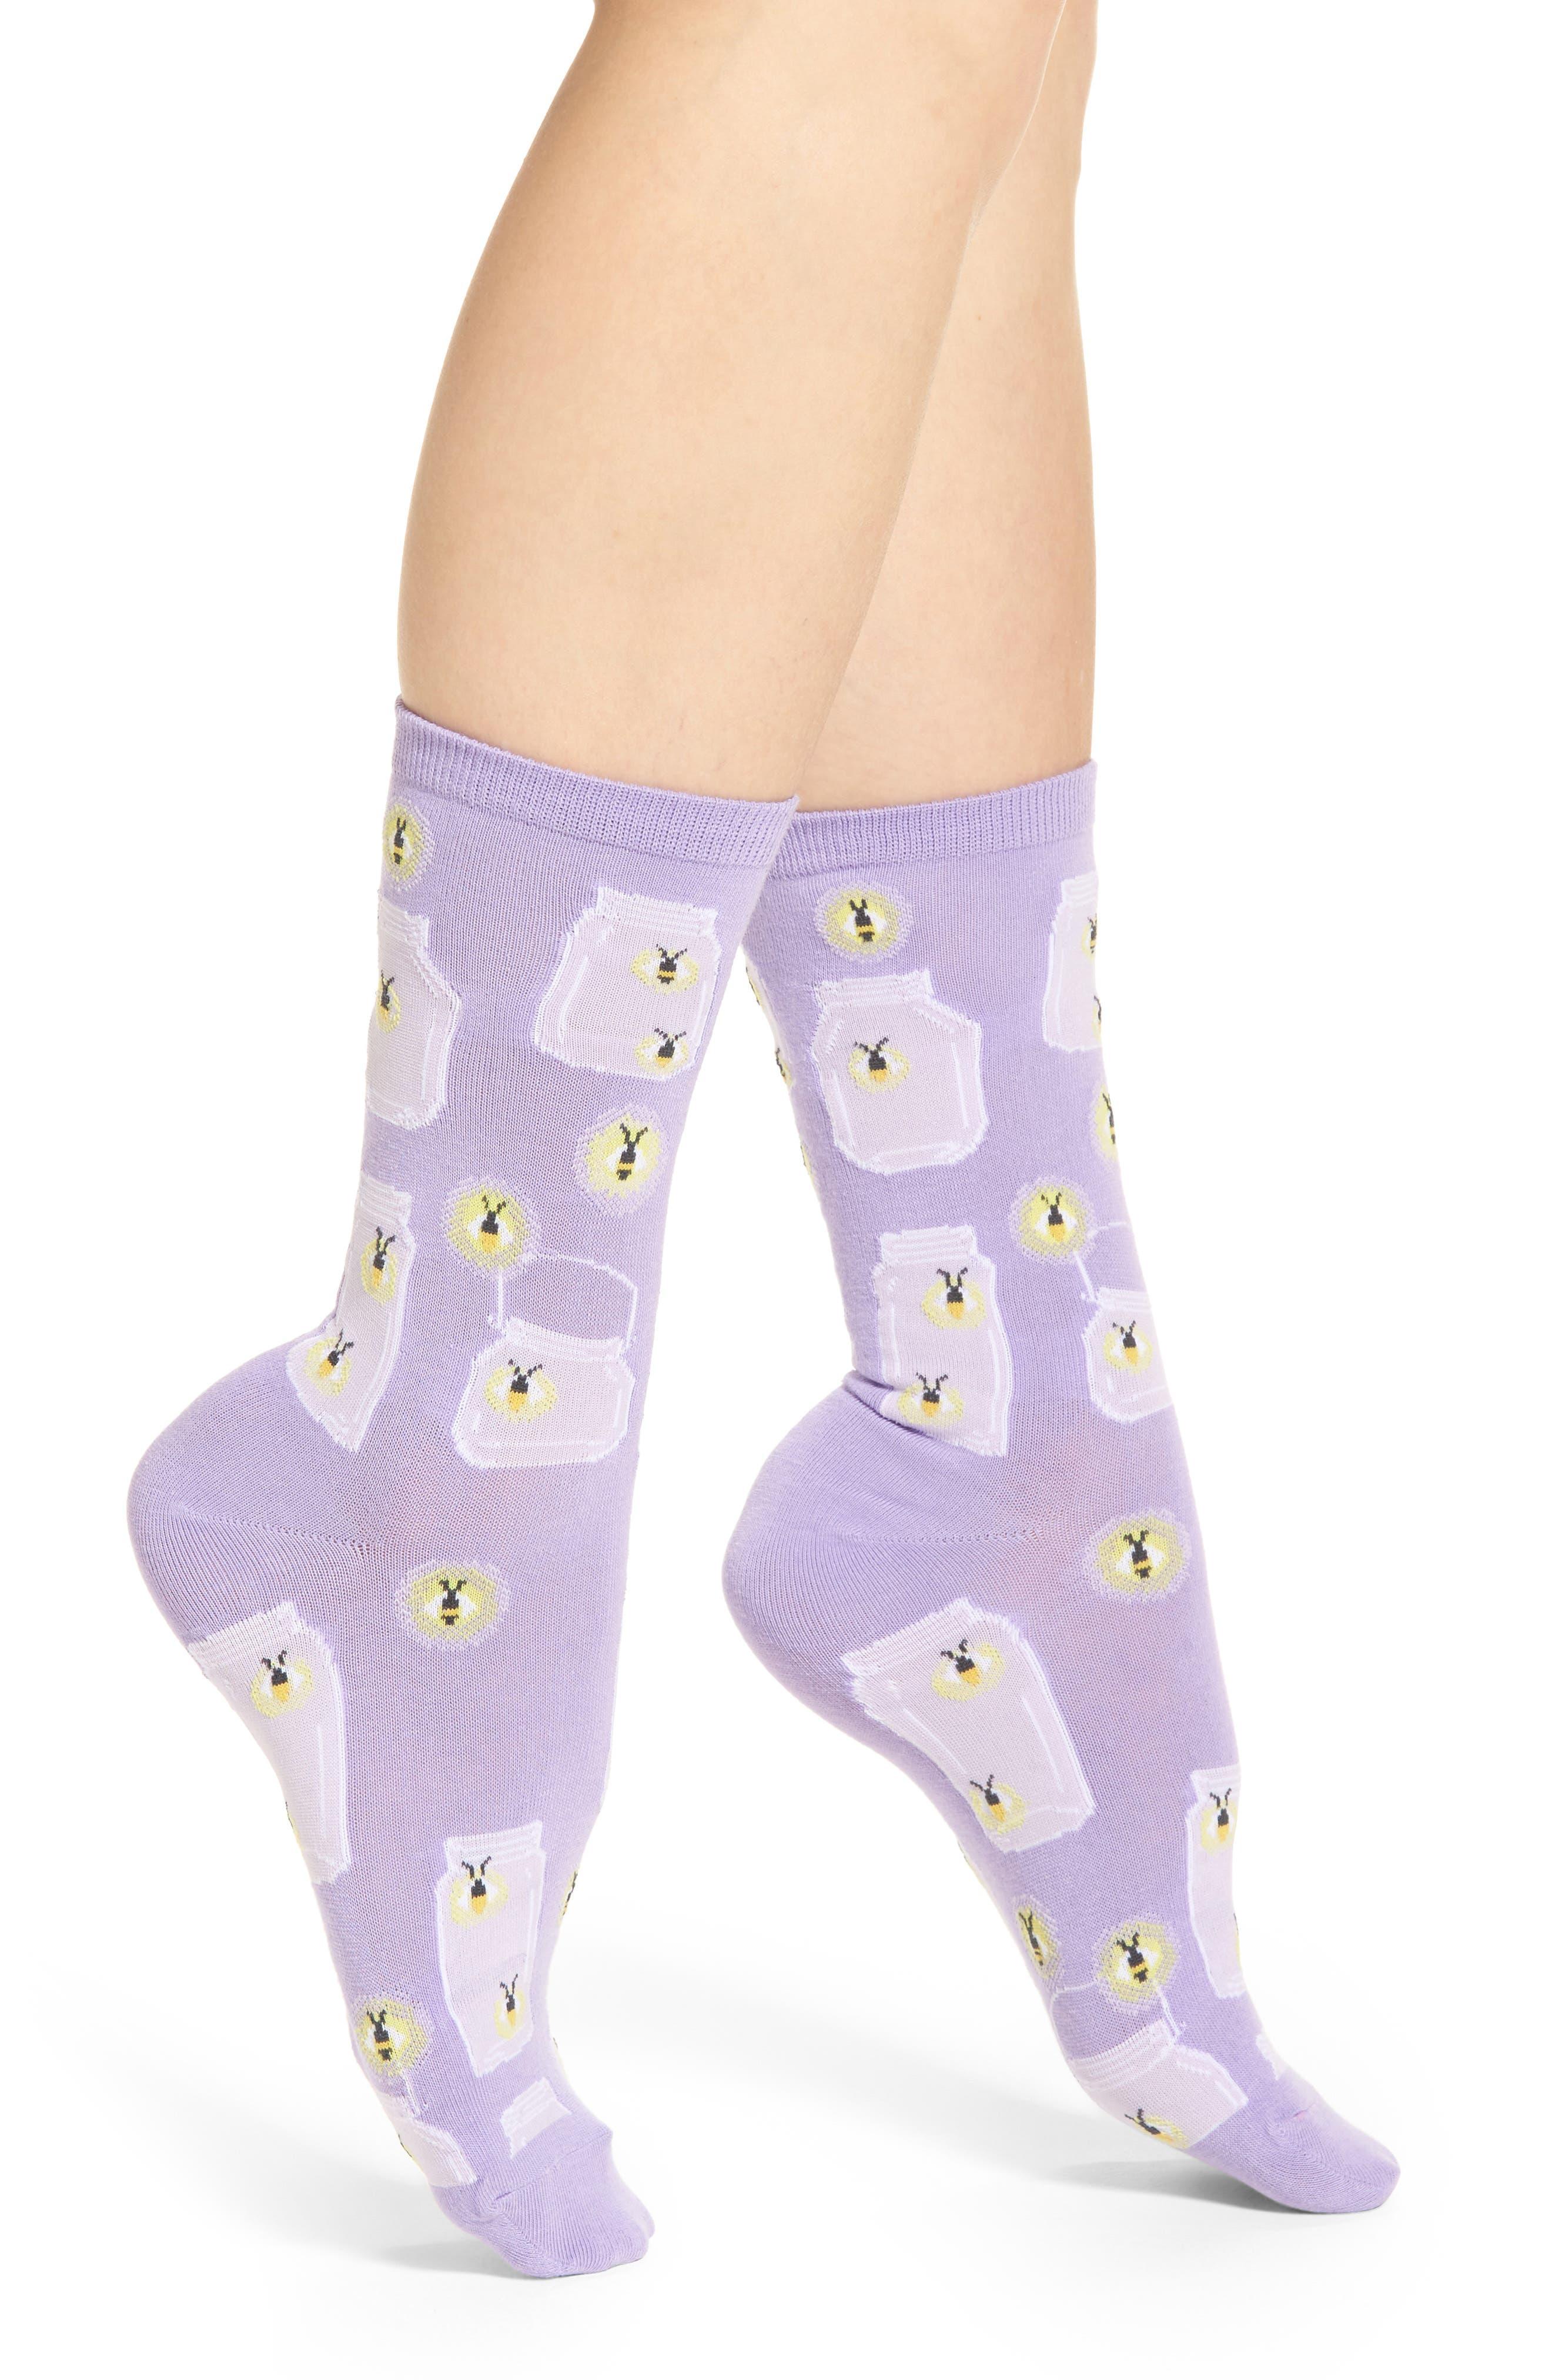 Fireflies Crew Socks,                         Main,                         color, Lavender